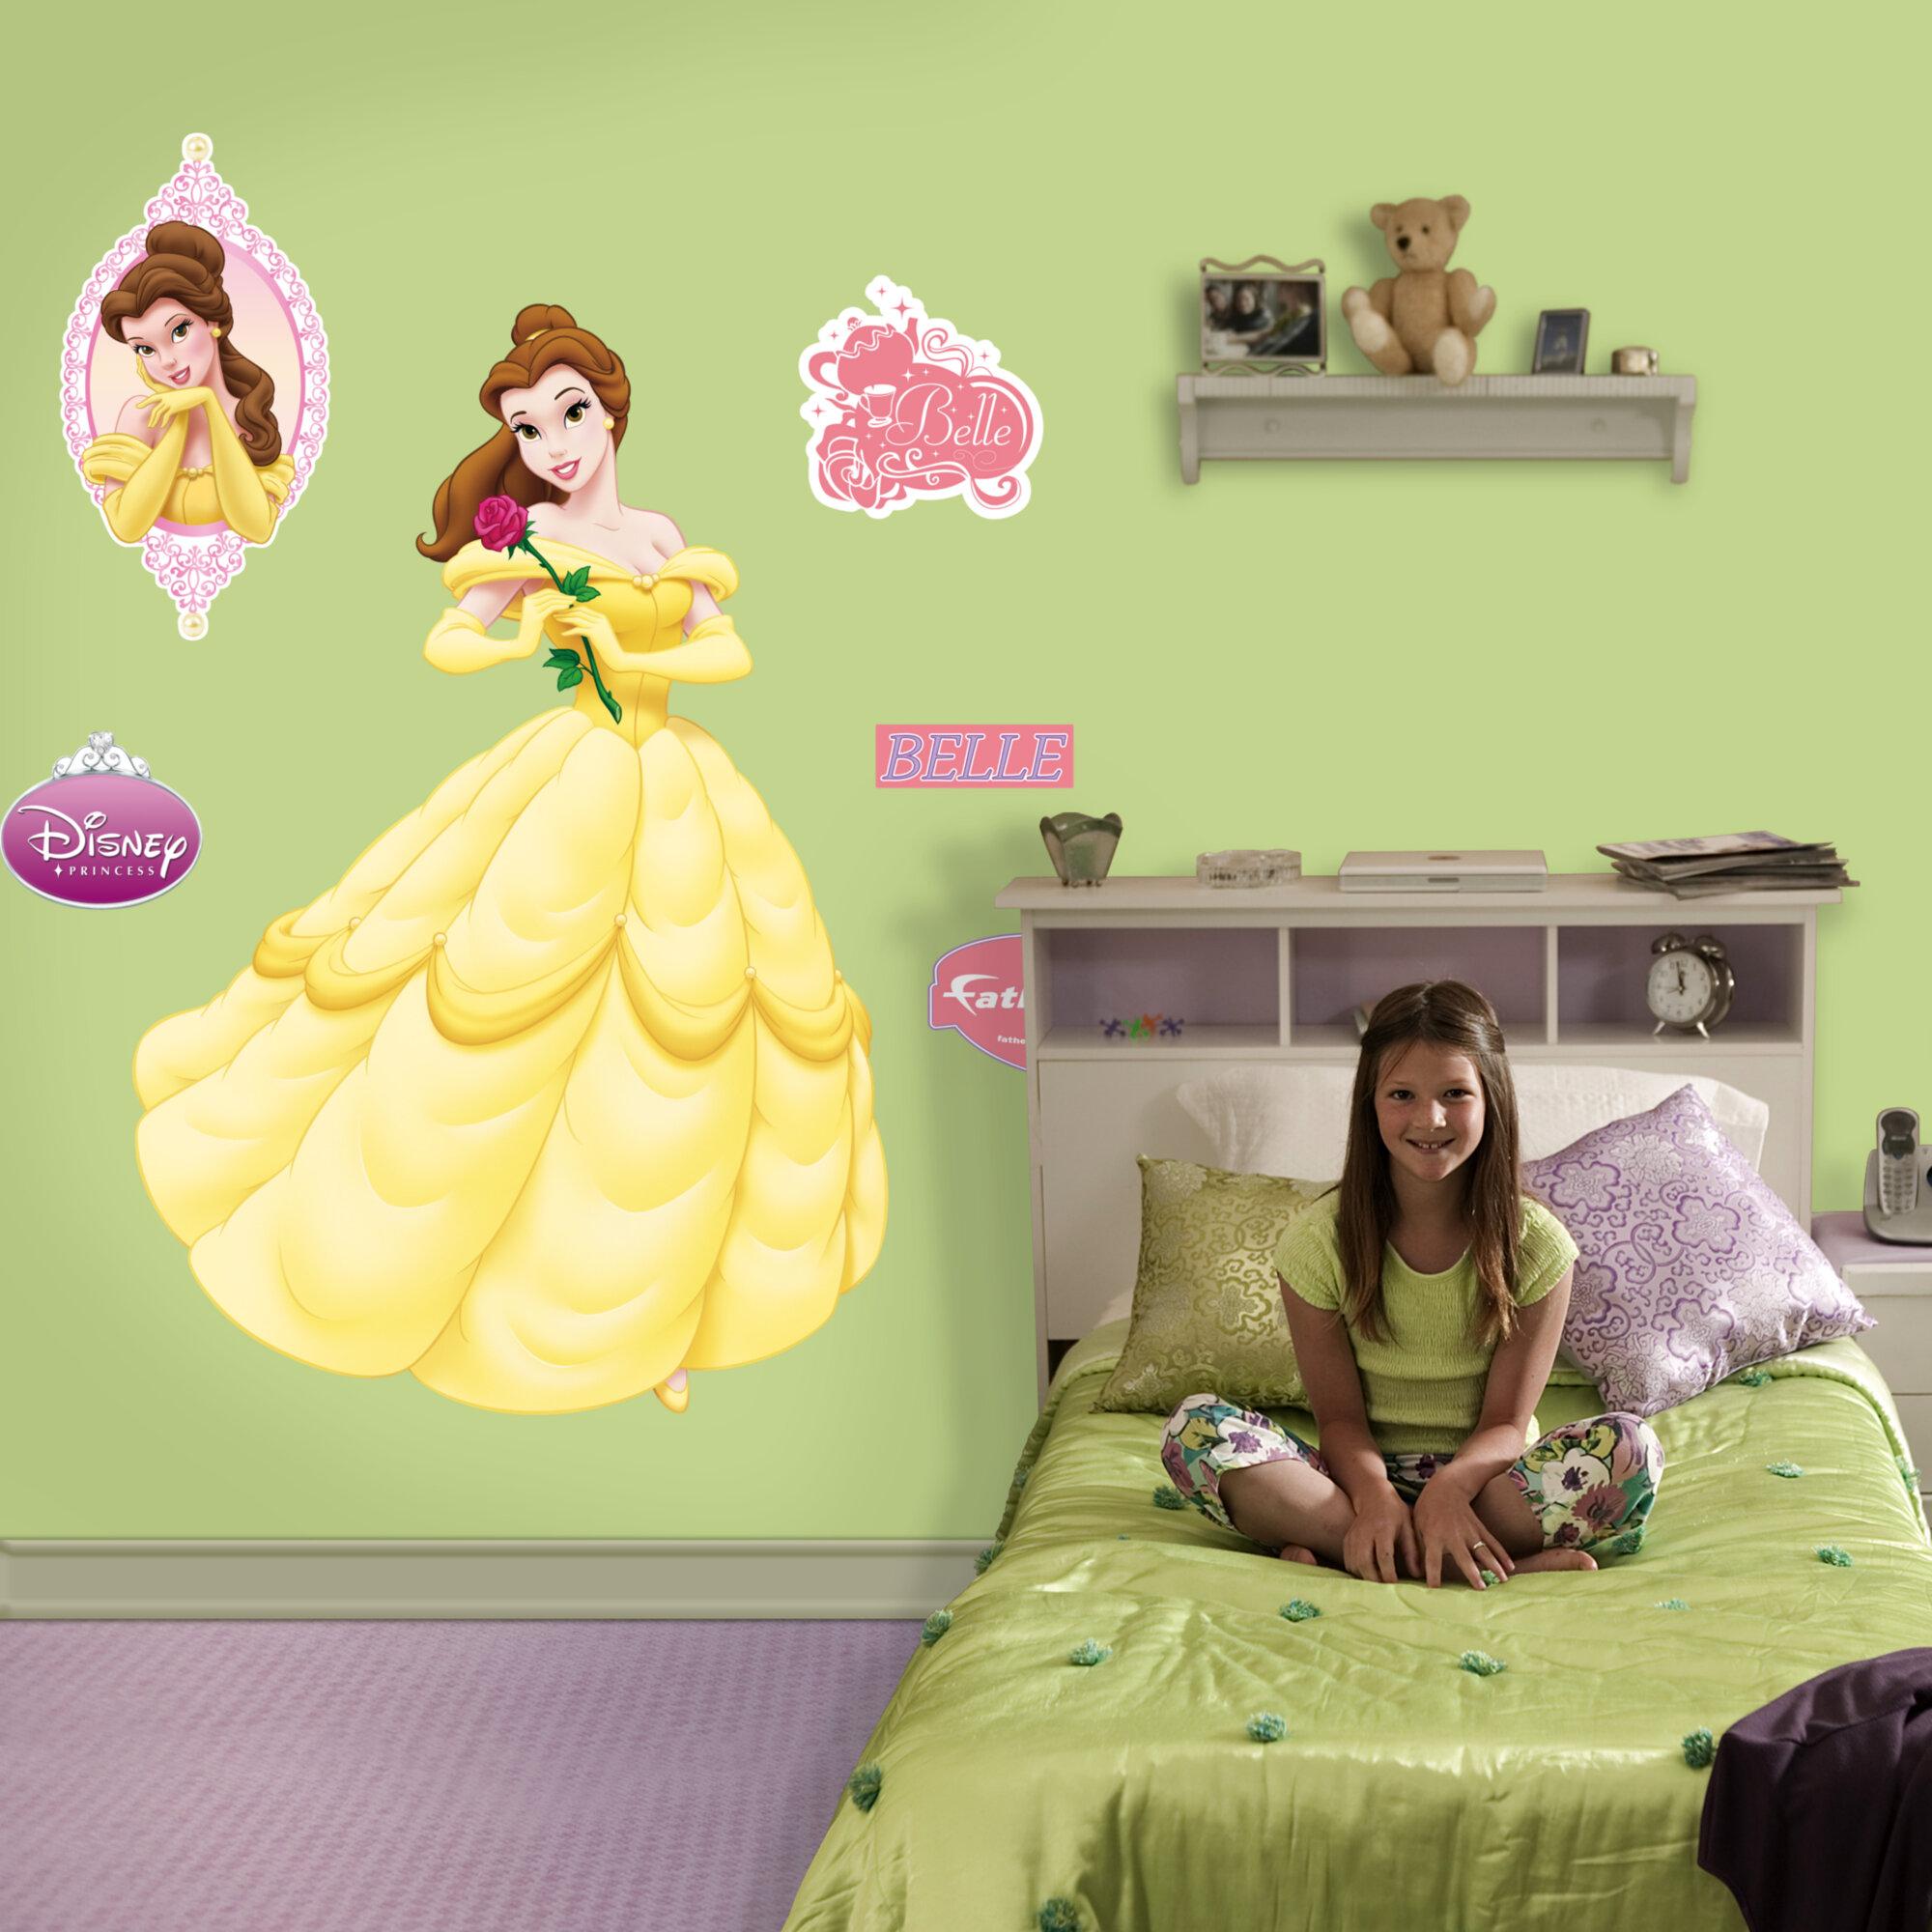 Fathead Disney Belle Wall Decal & Reviews | Wayfair